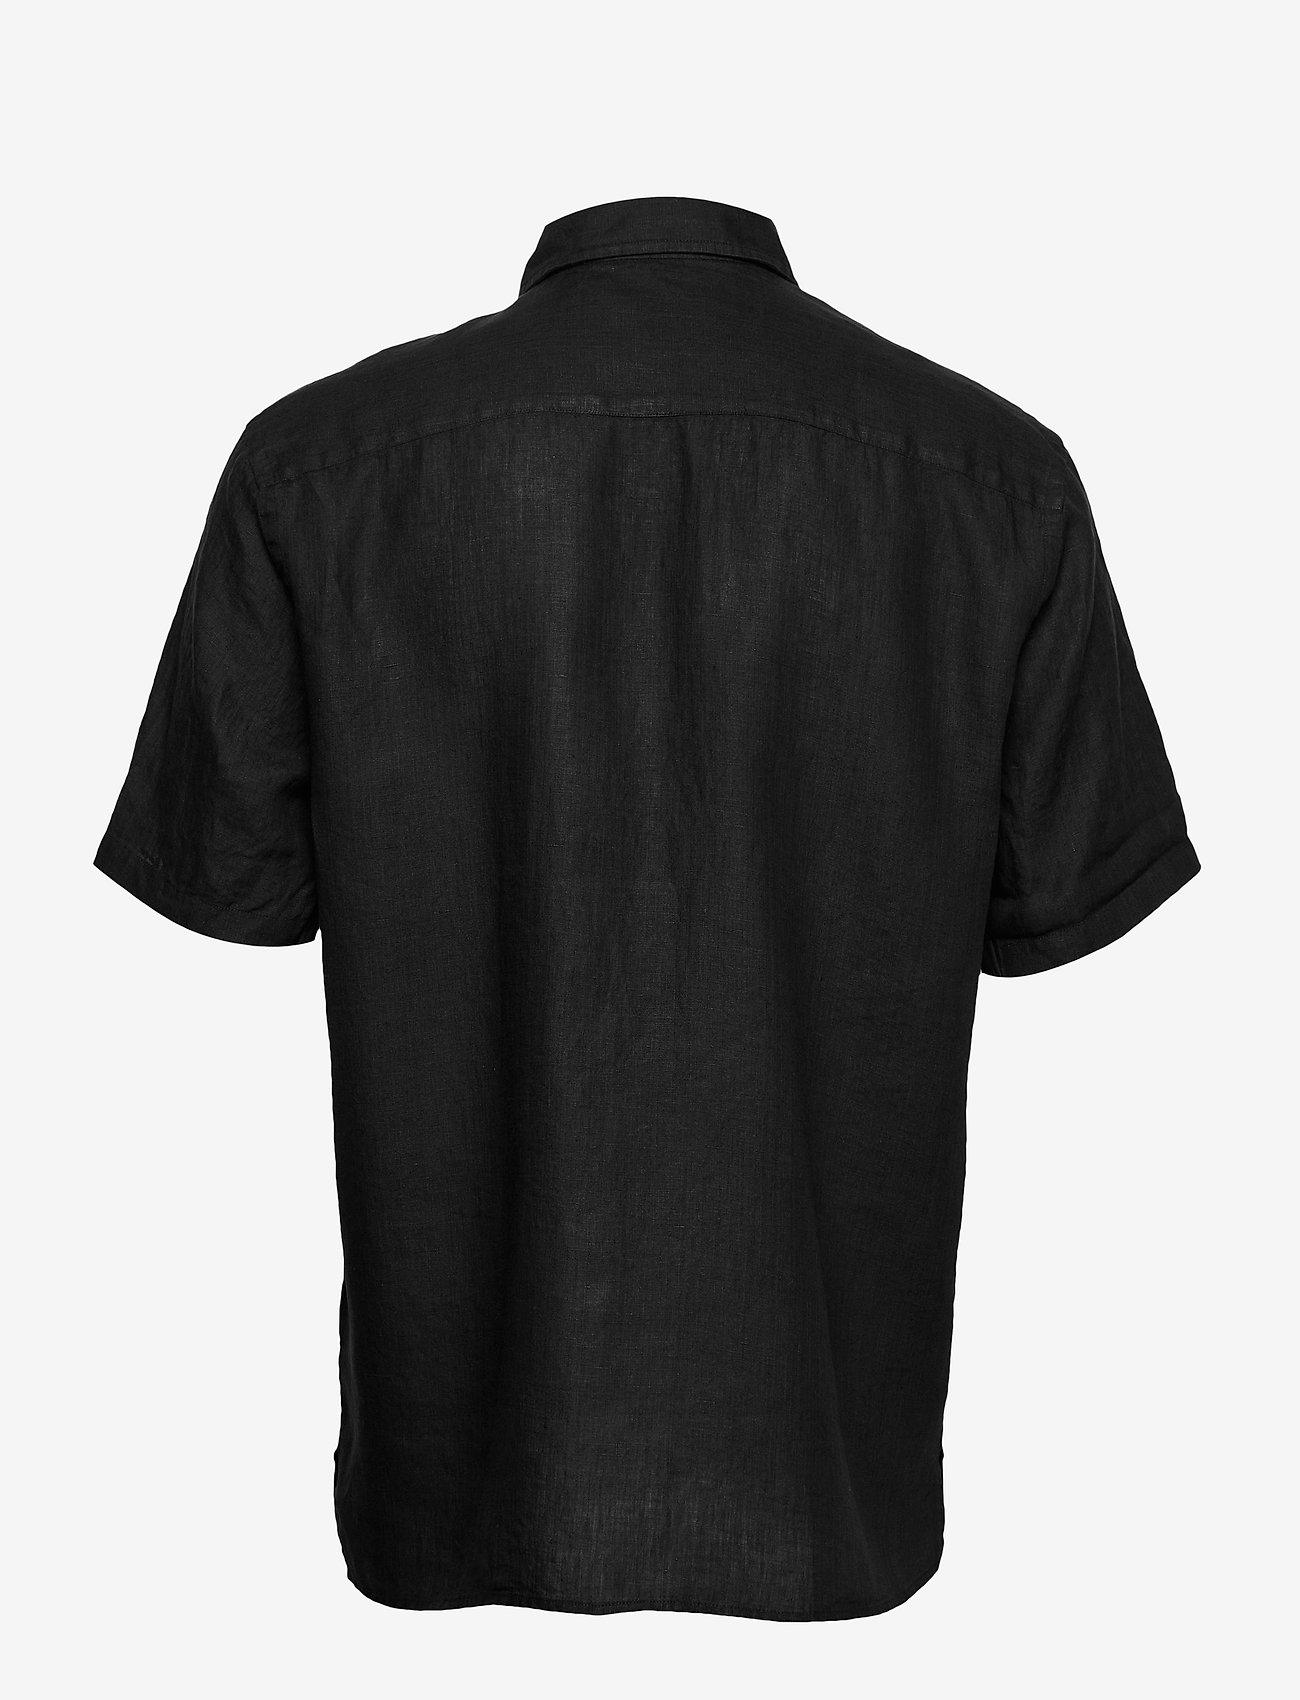 Resort Linen Shirt (Gold) - Eton gZPrmO